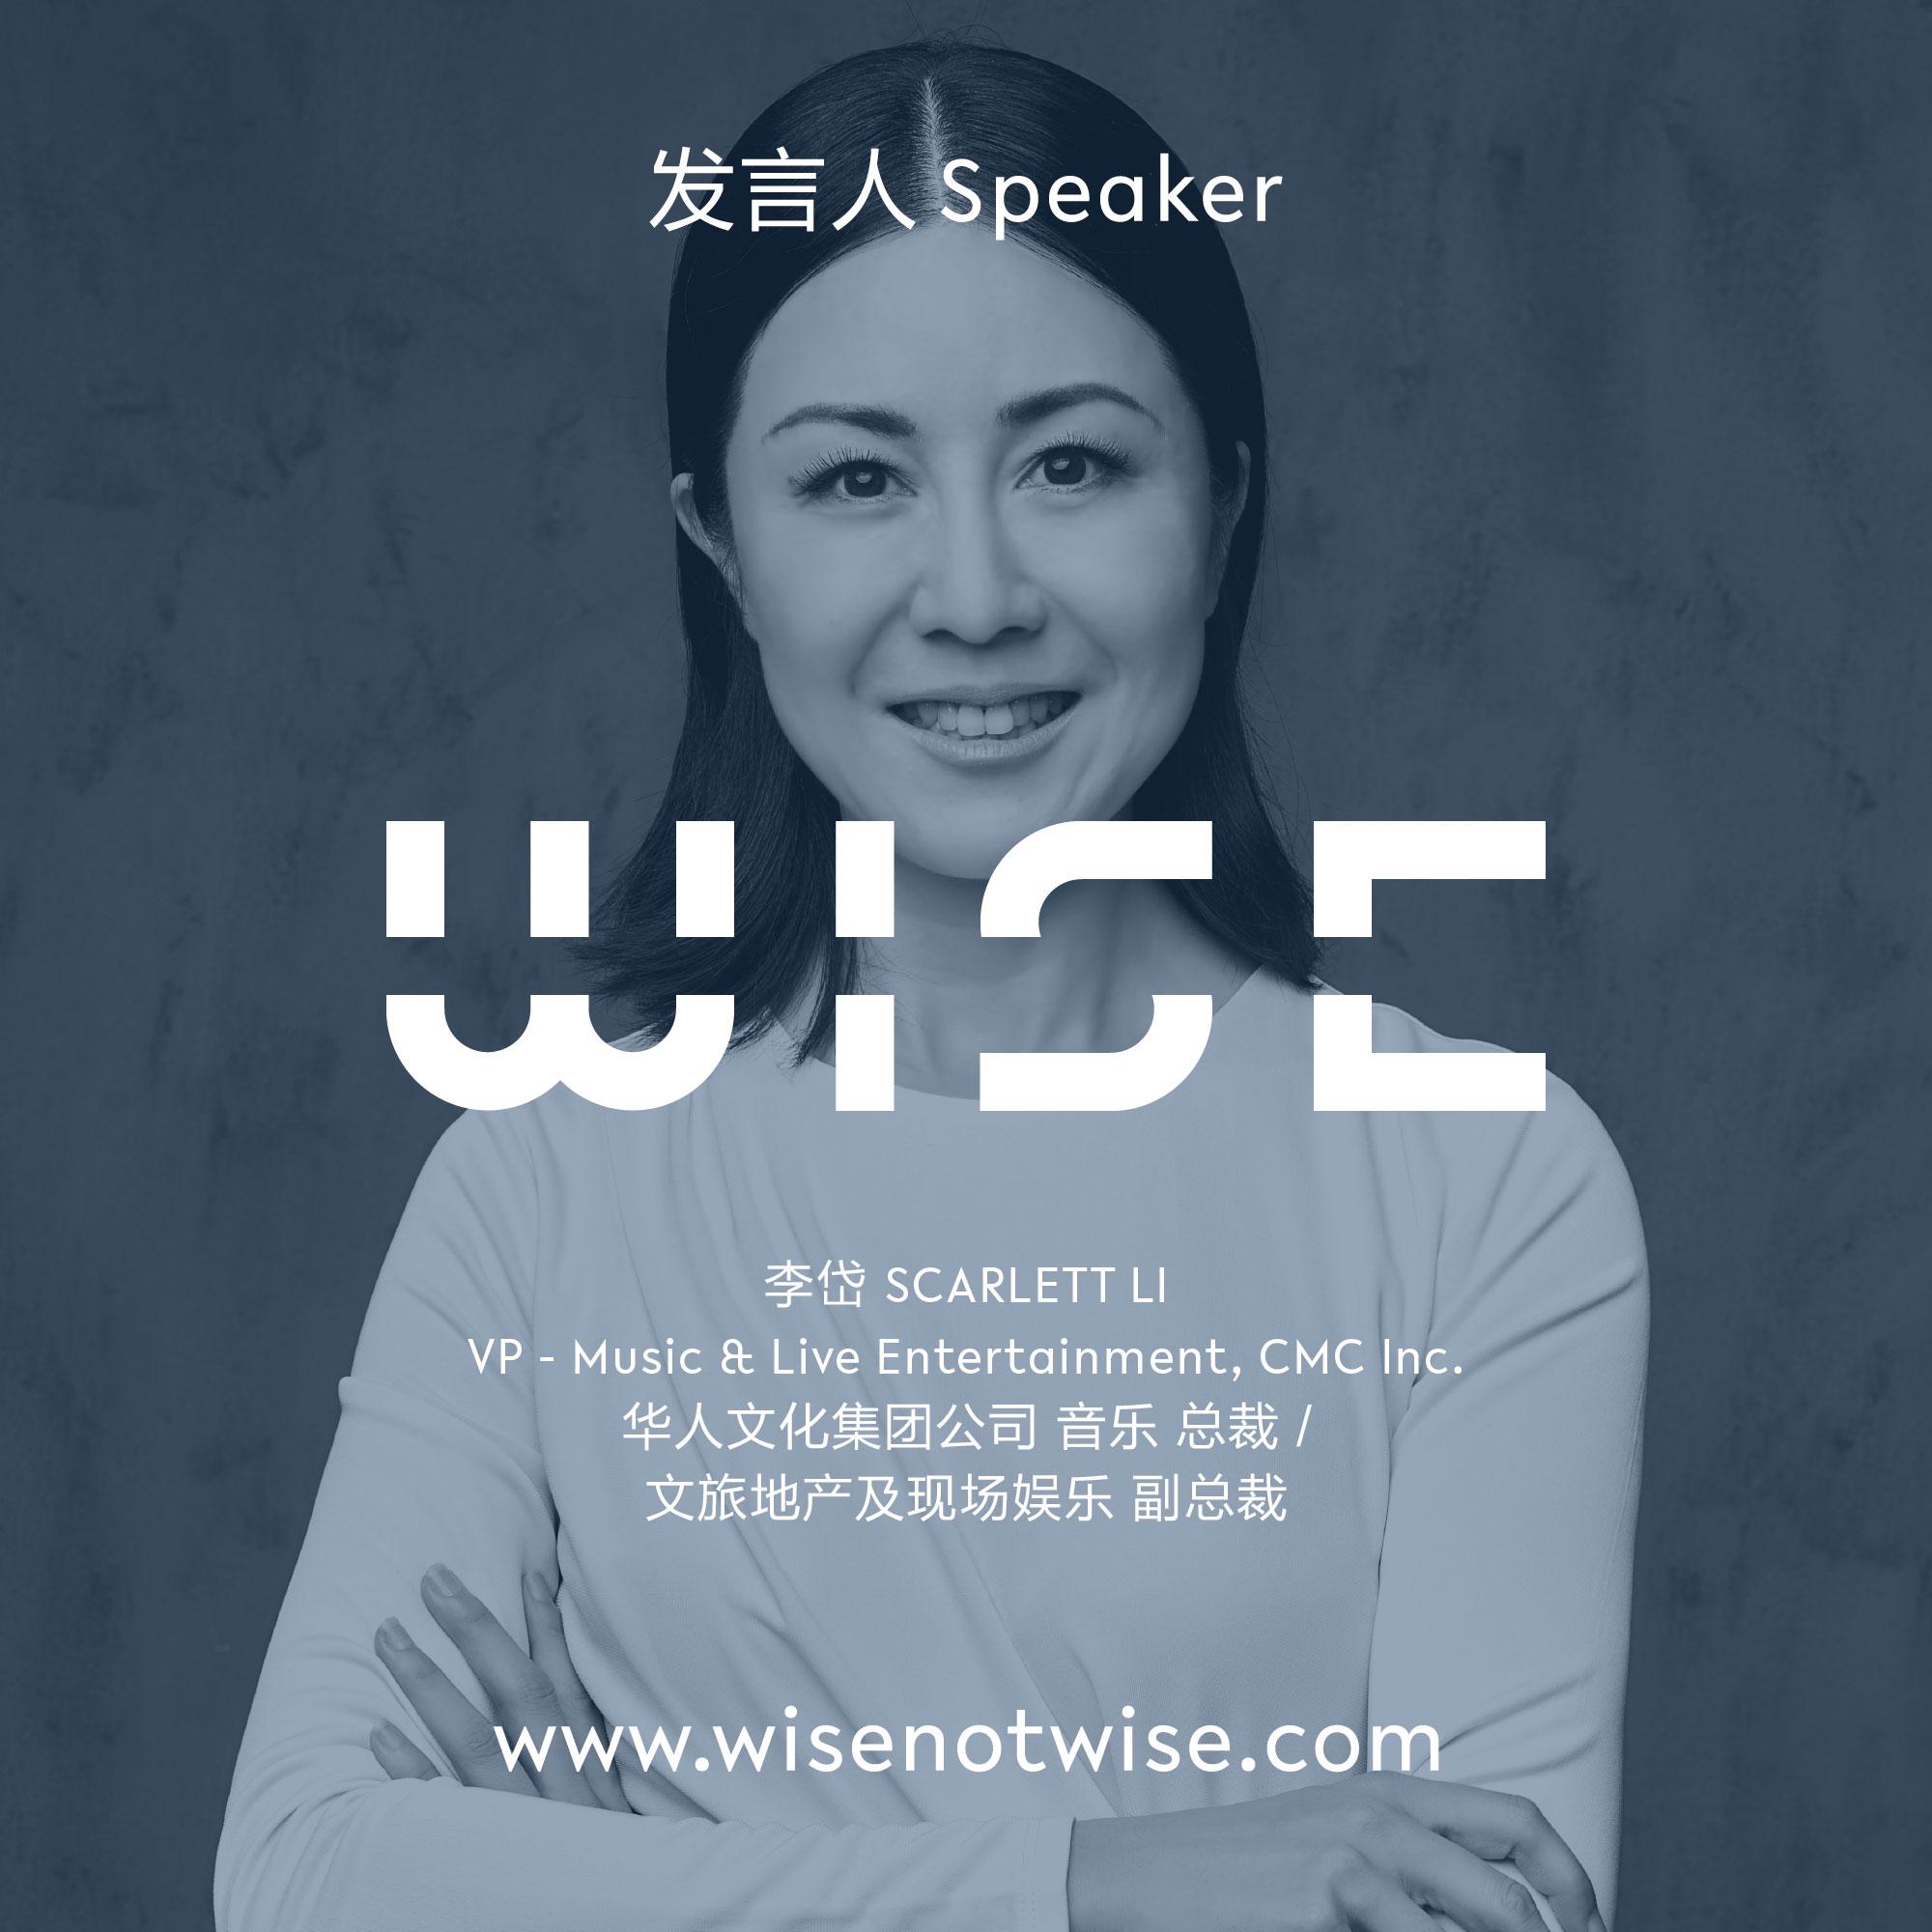 Scarlett Li (Vice President of Music & Live Entertainment, CMC Inc.)